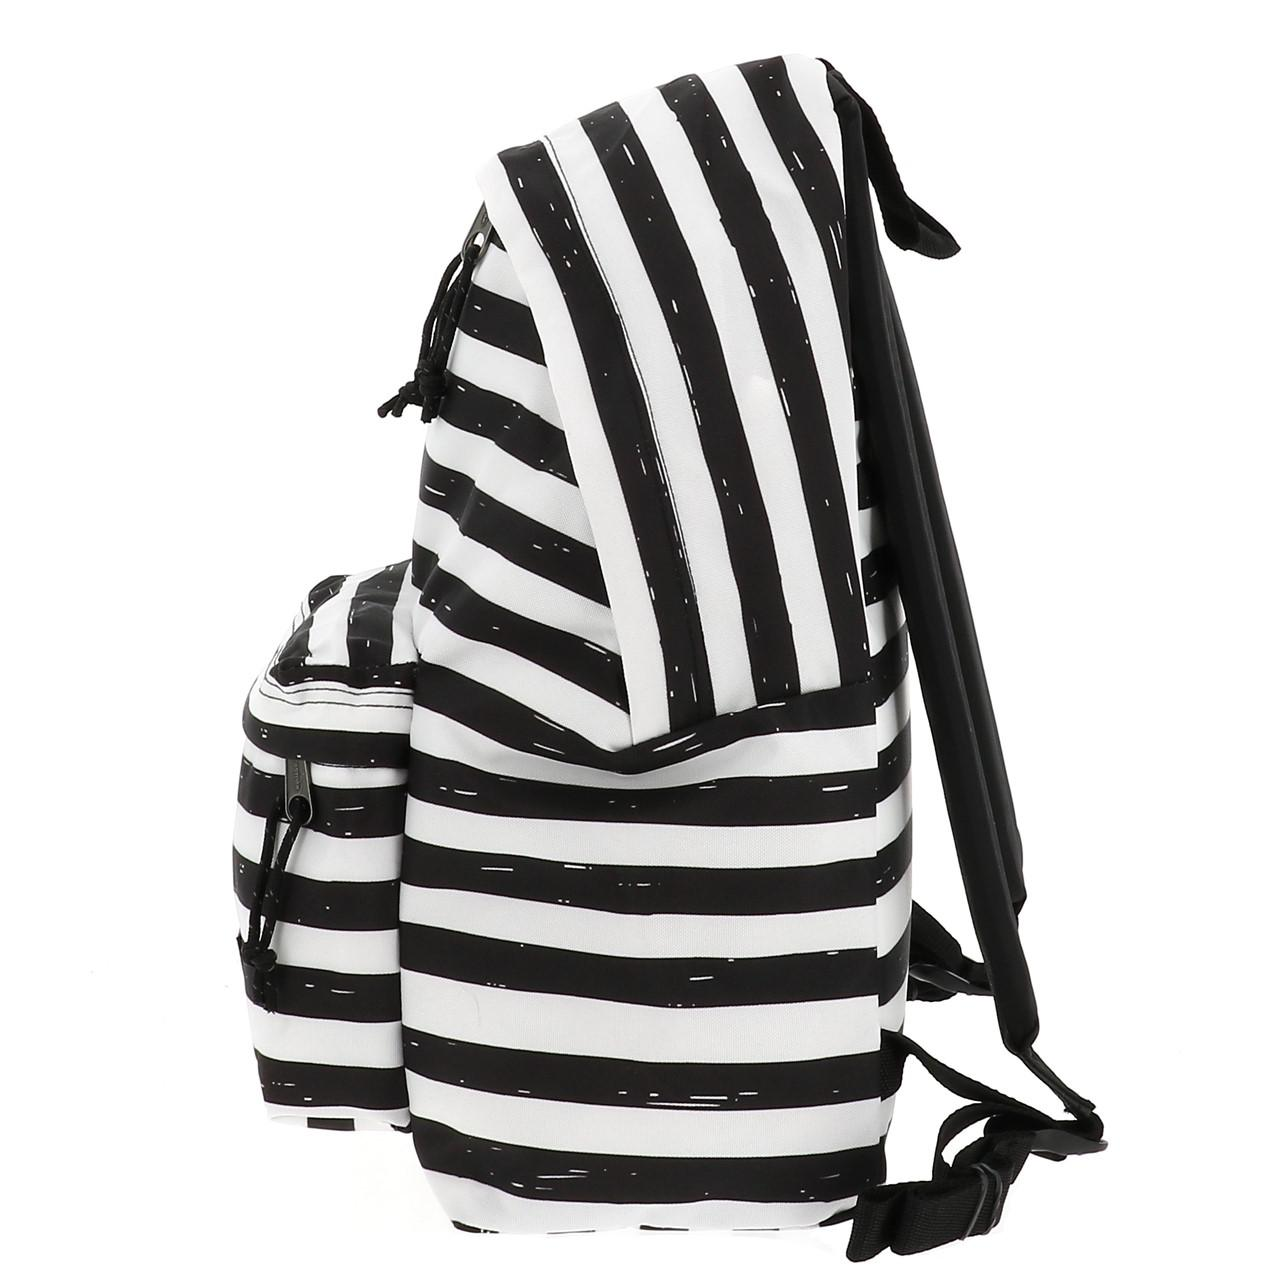 Sac-a-dos-college-Eastpak-Padded-strip-it-black-24l-Noir-70406-Neuf miniature 5